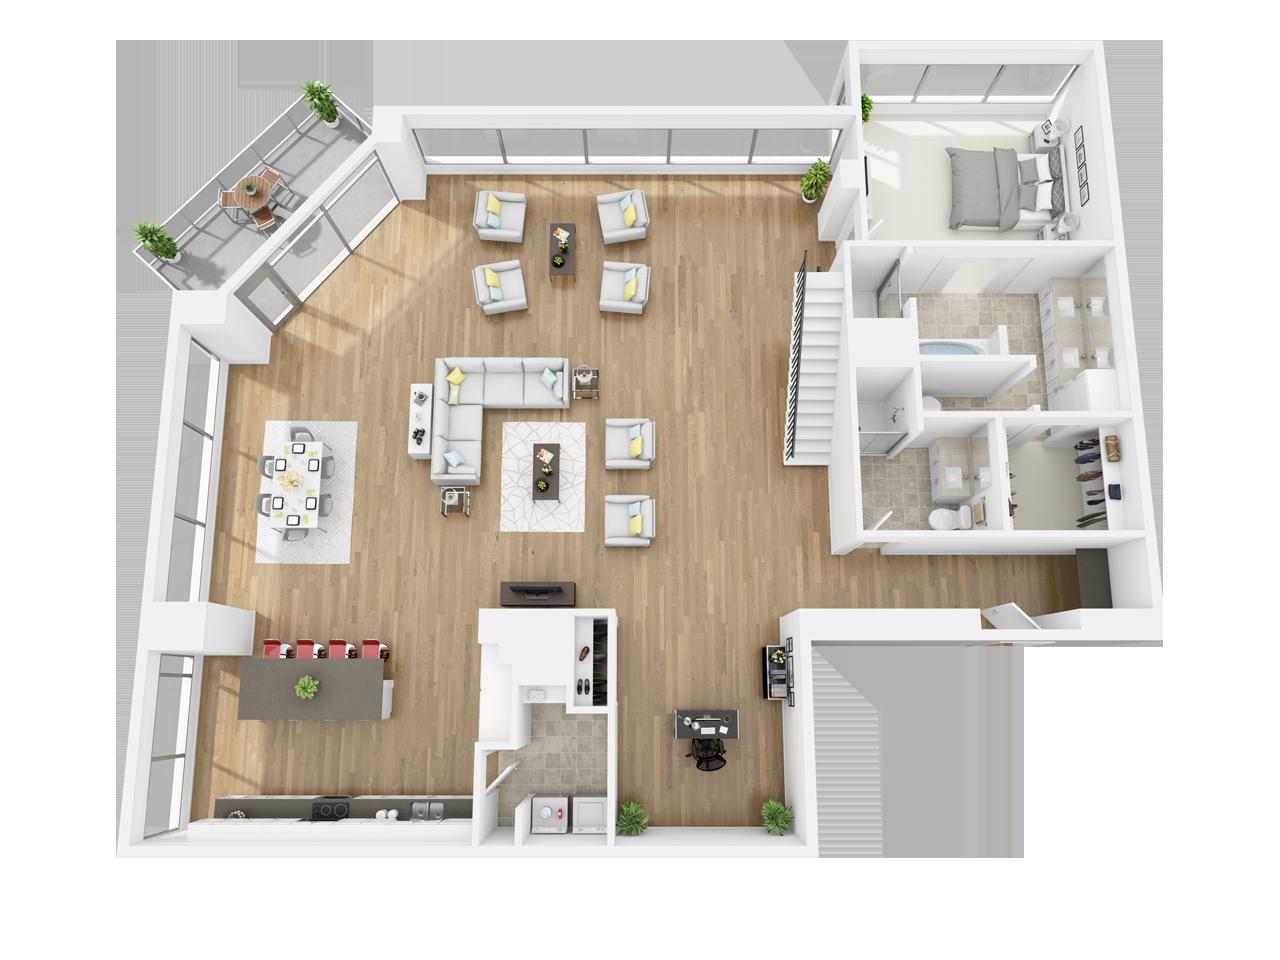 1 2 3 Bedroom Downtown Los Angeles Ca Apartments Apartment Floor Plans Apartment Floor Plan Downtown Apartment